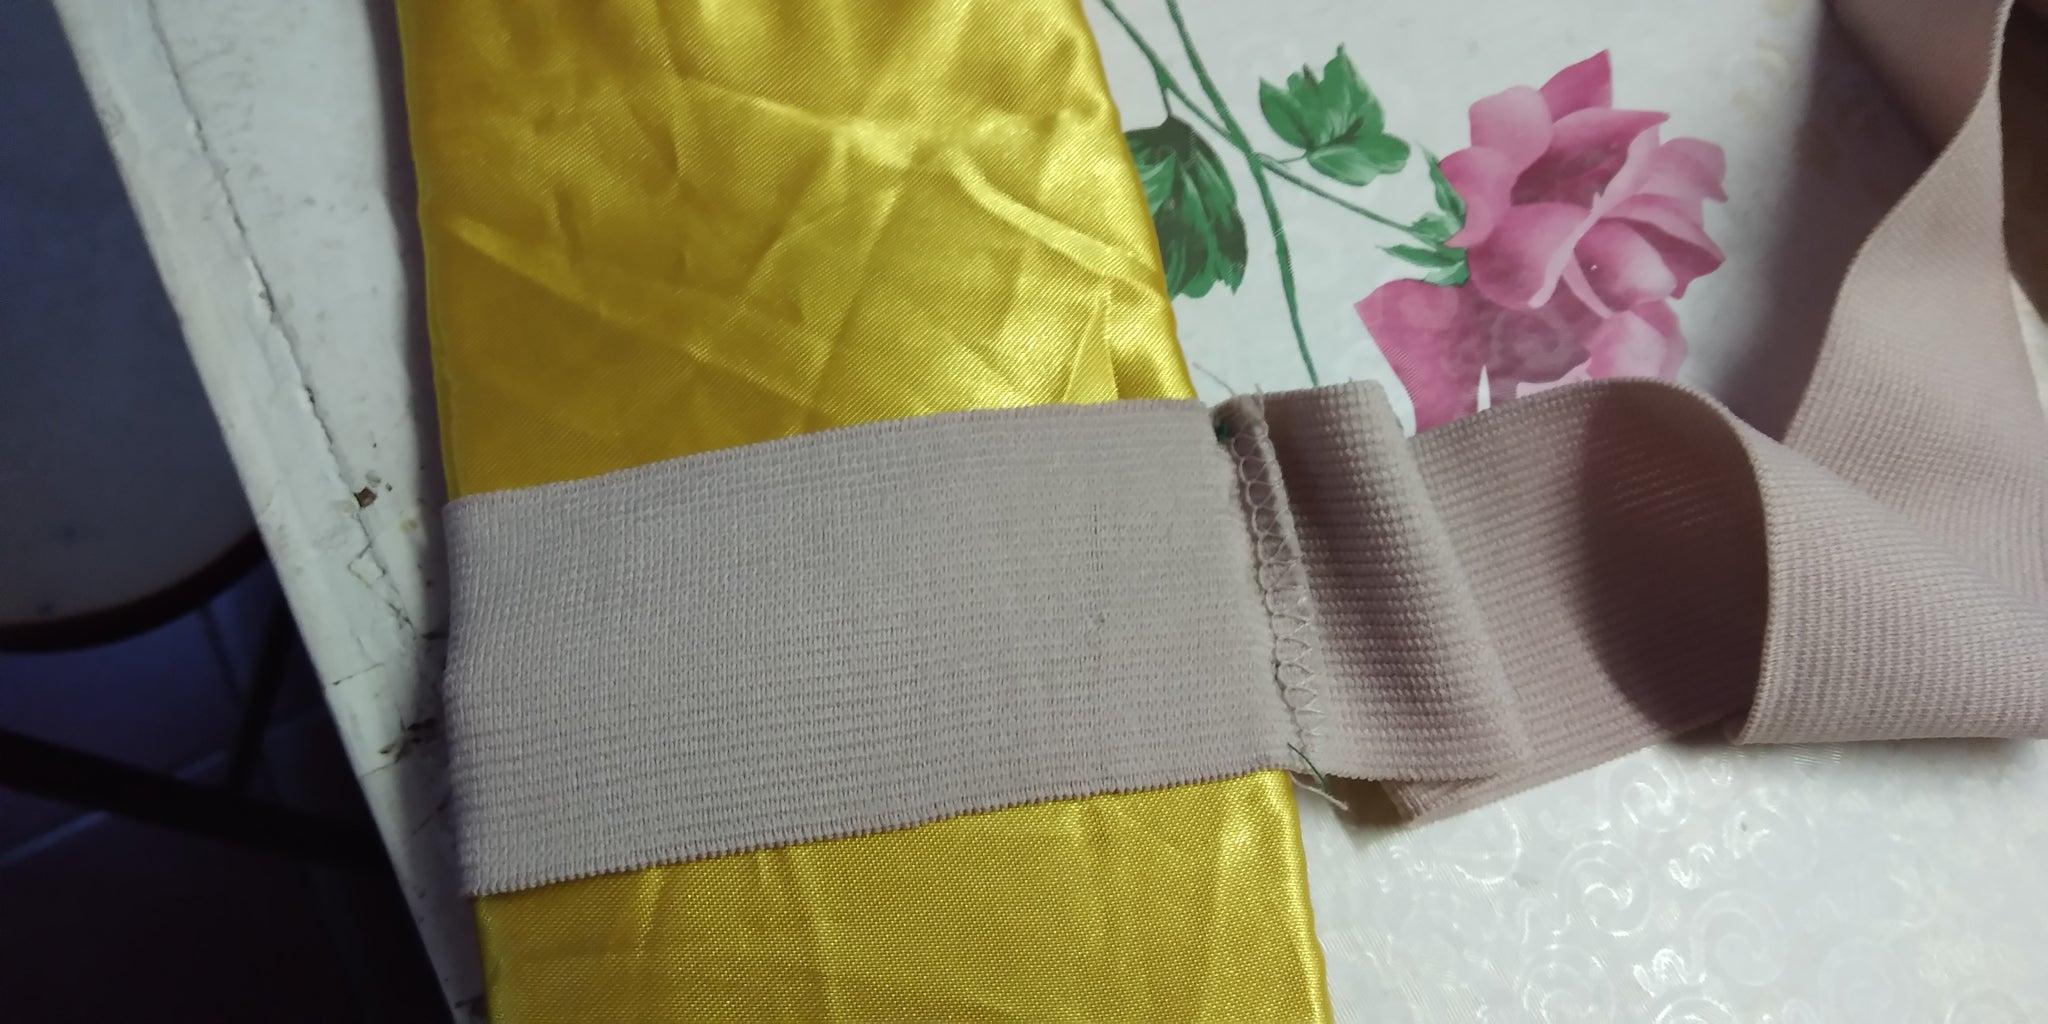 Sew Cloth and Elastic Bandage